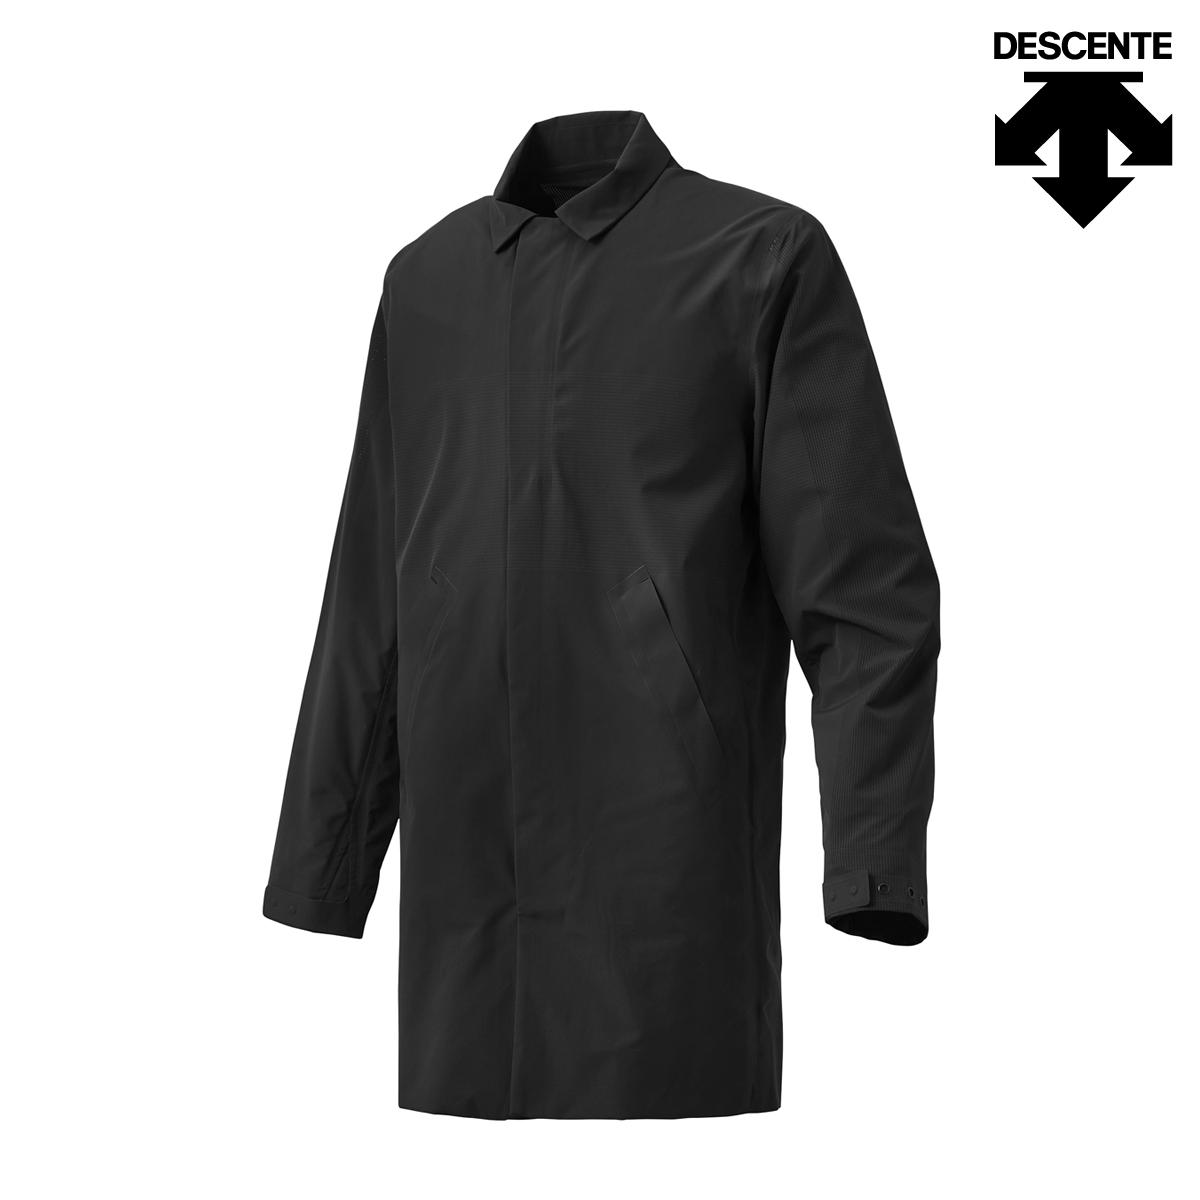 DESCENTE ALLTERRAIN SCHEMATECH AIR STRETCH COAT(BLACK)(デサント オルテライン スキーマテック エアー ストレッチ コート)【メンズ】【ジャケット】【18SP-I】